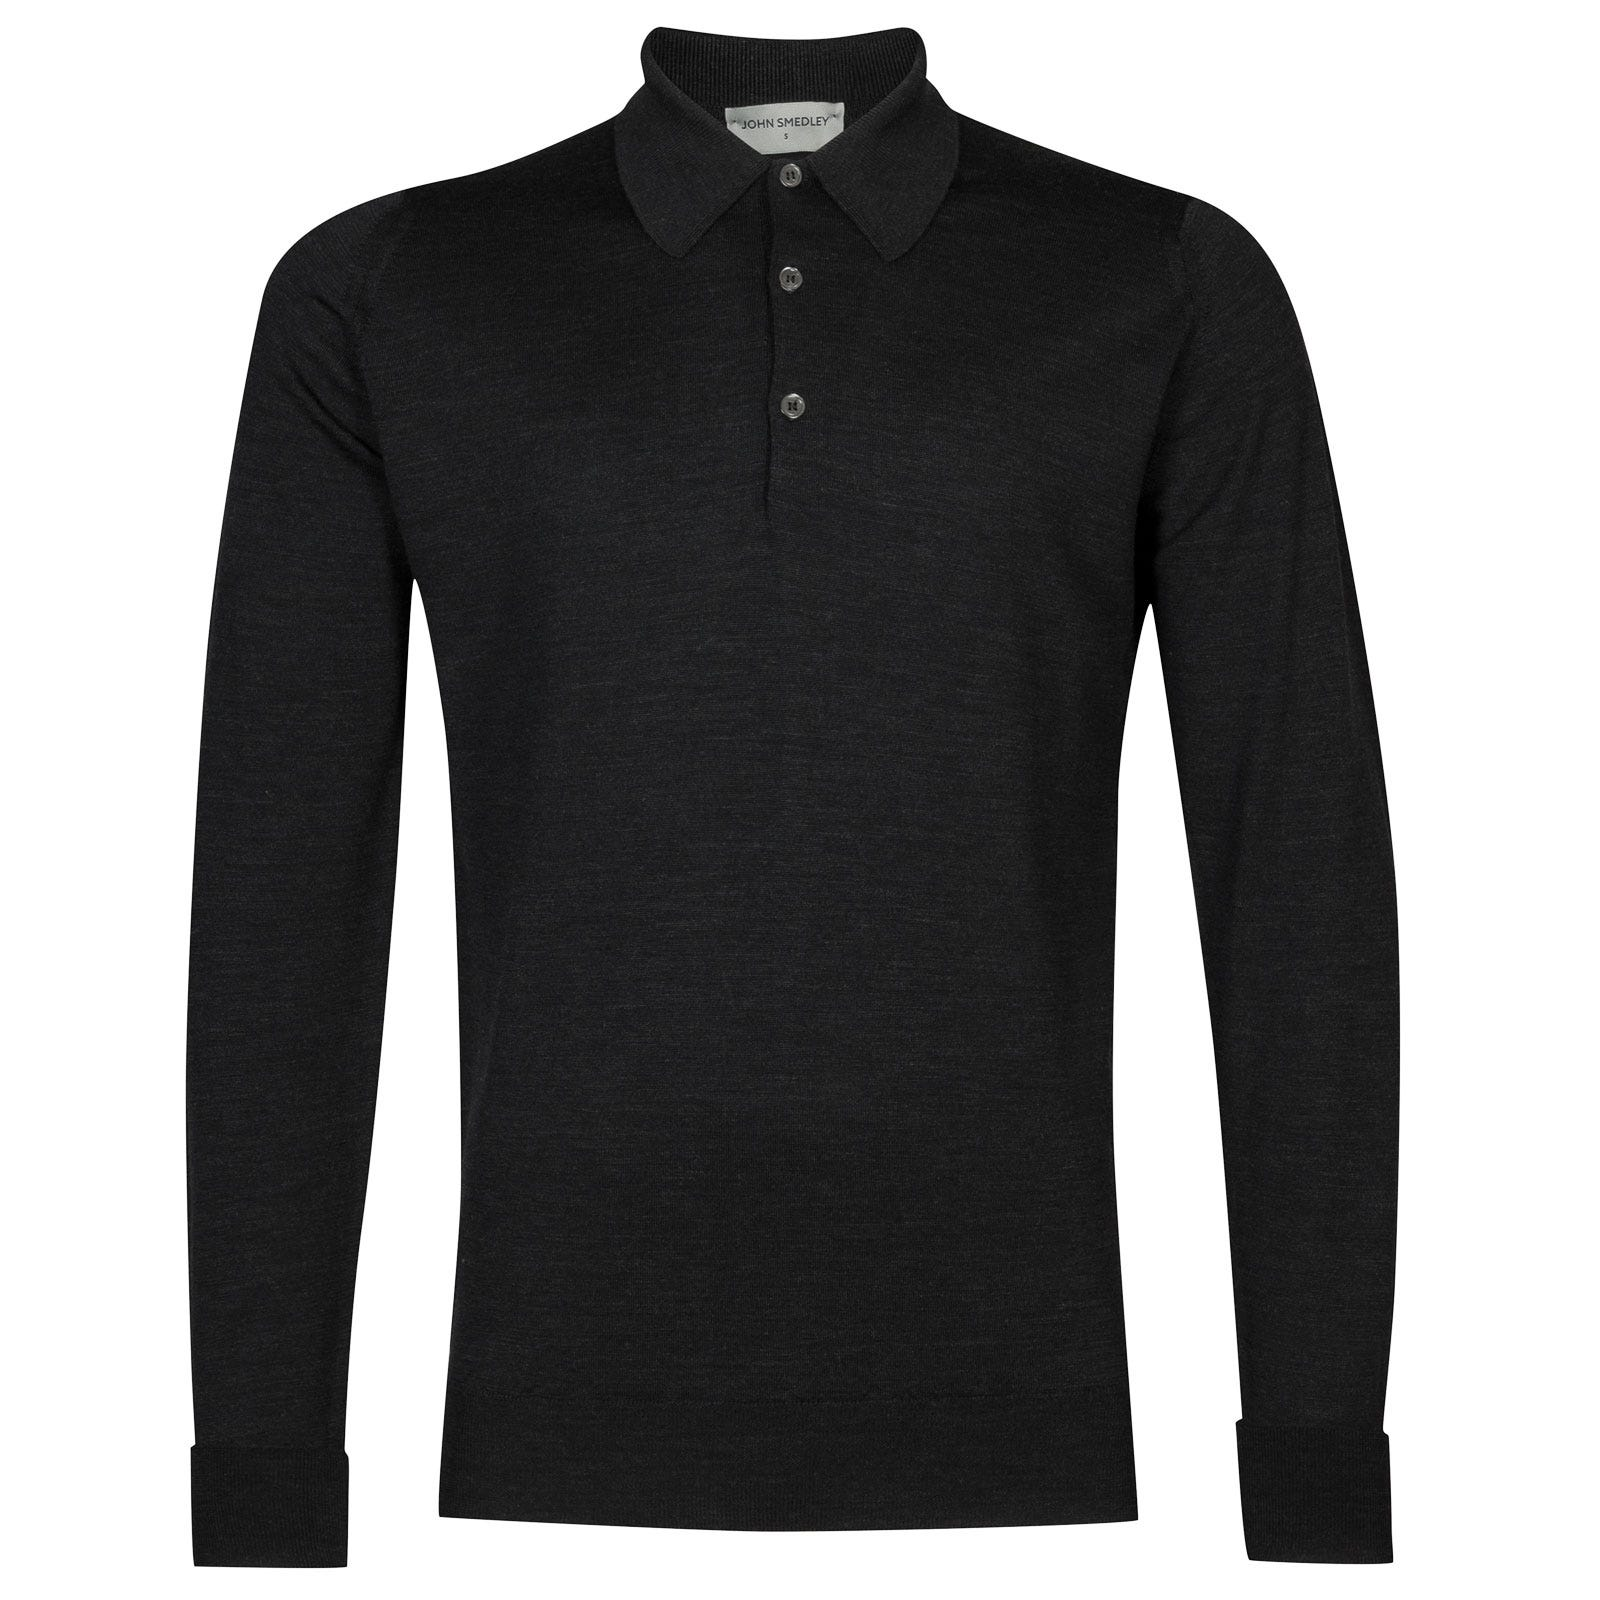 John Smedley dorset Merino Wool Shirt in Hepburn Smoke-L